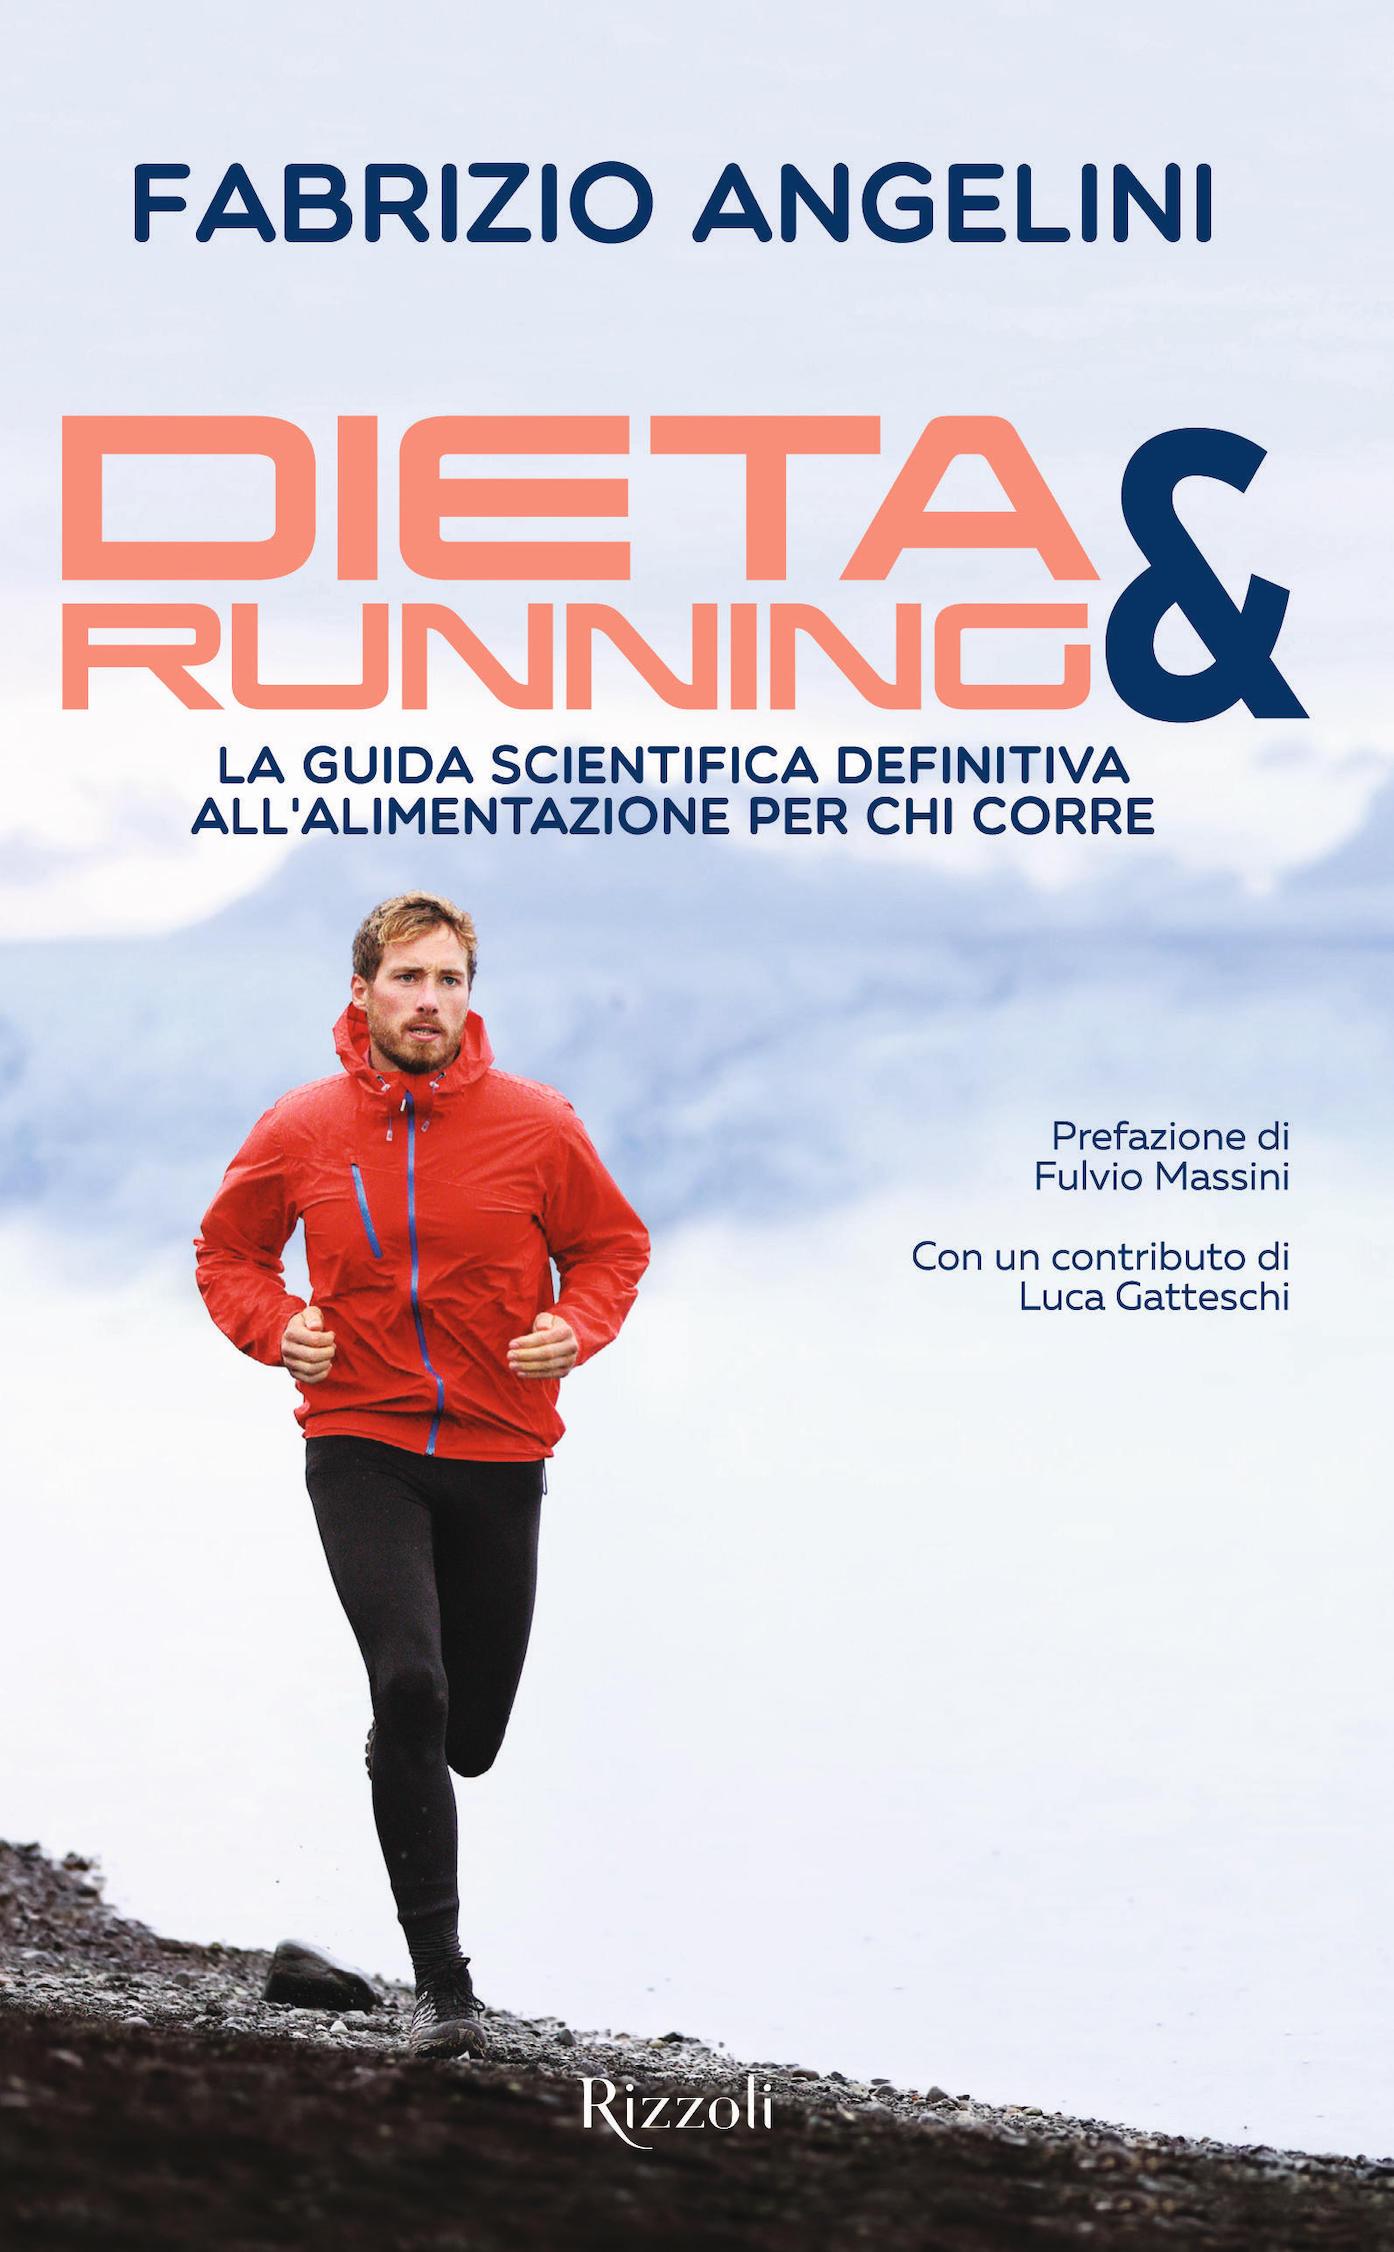 """Dieta & running"": correre, nutrirsi, vivere"